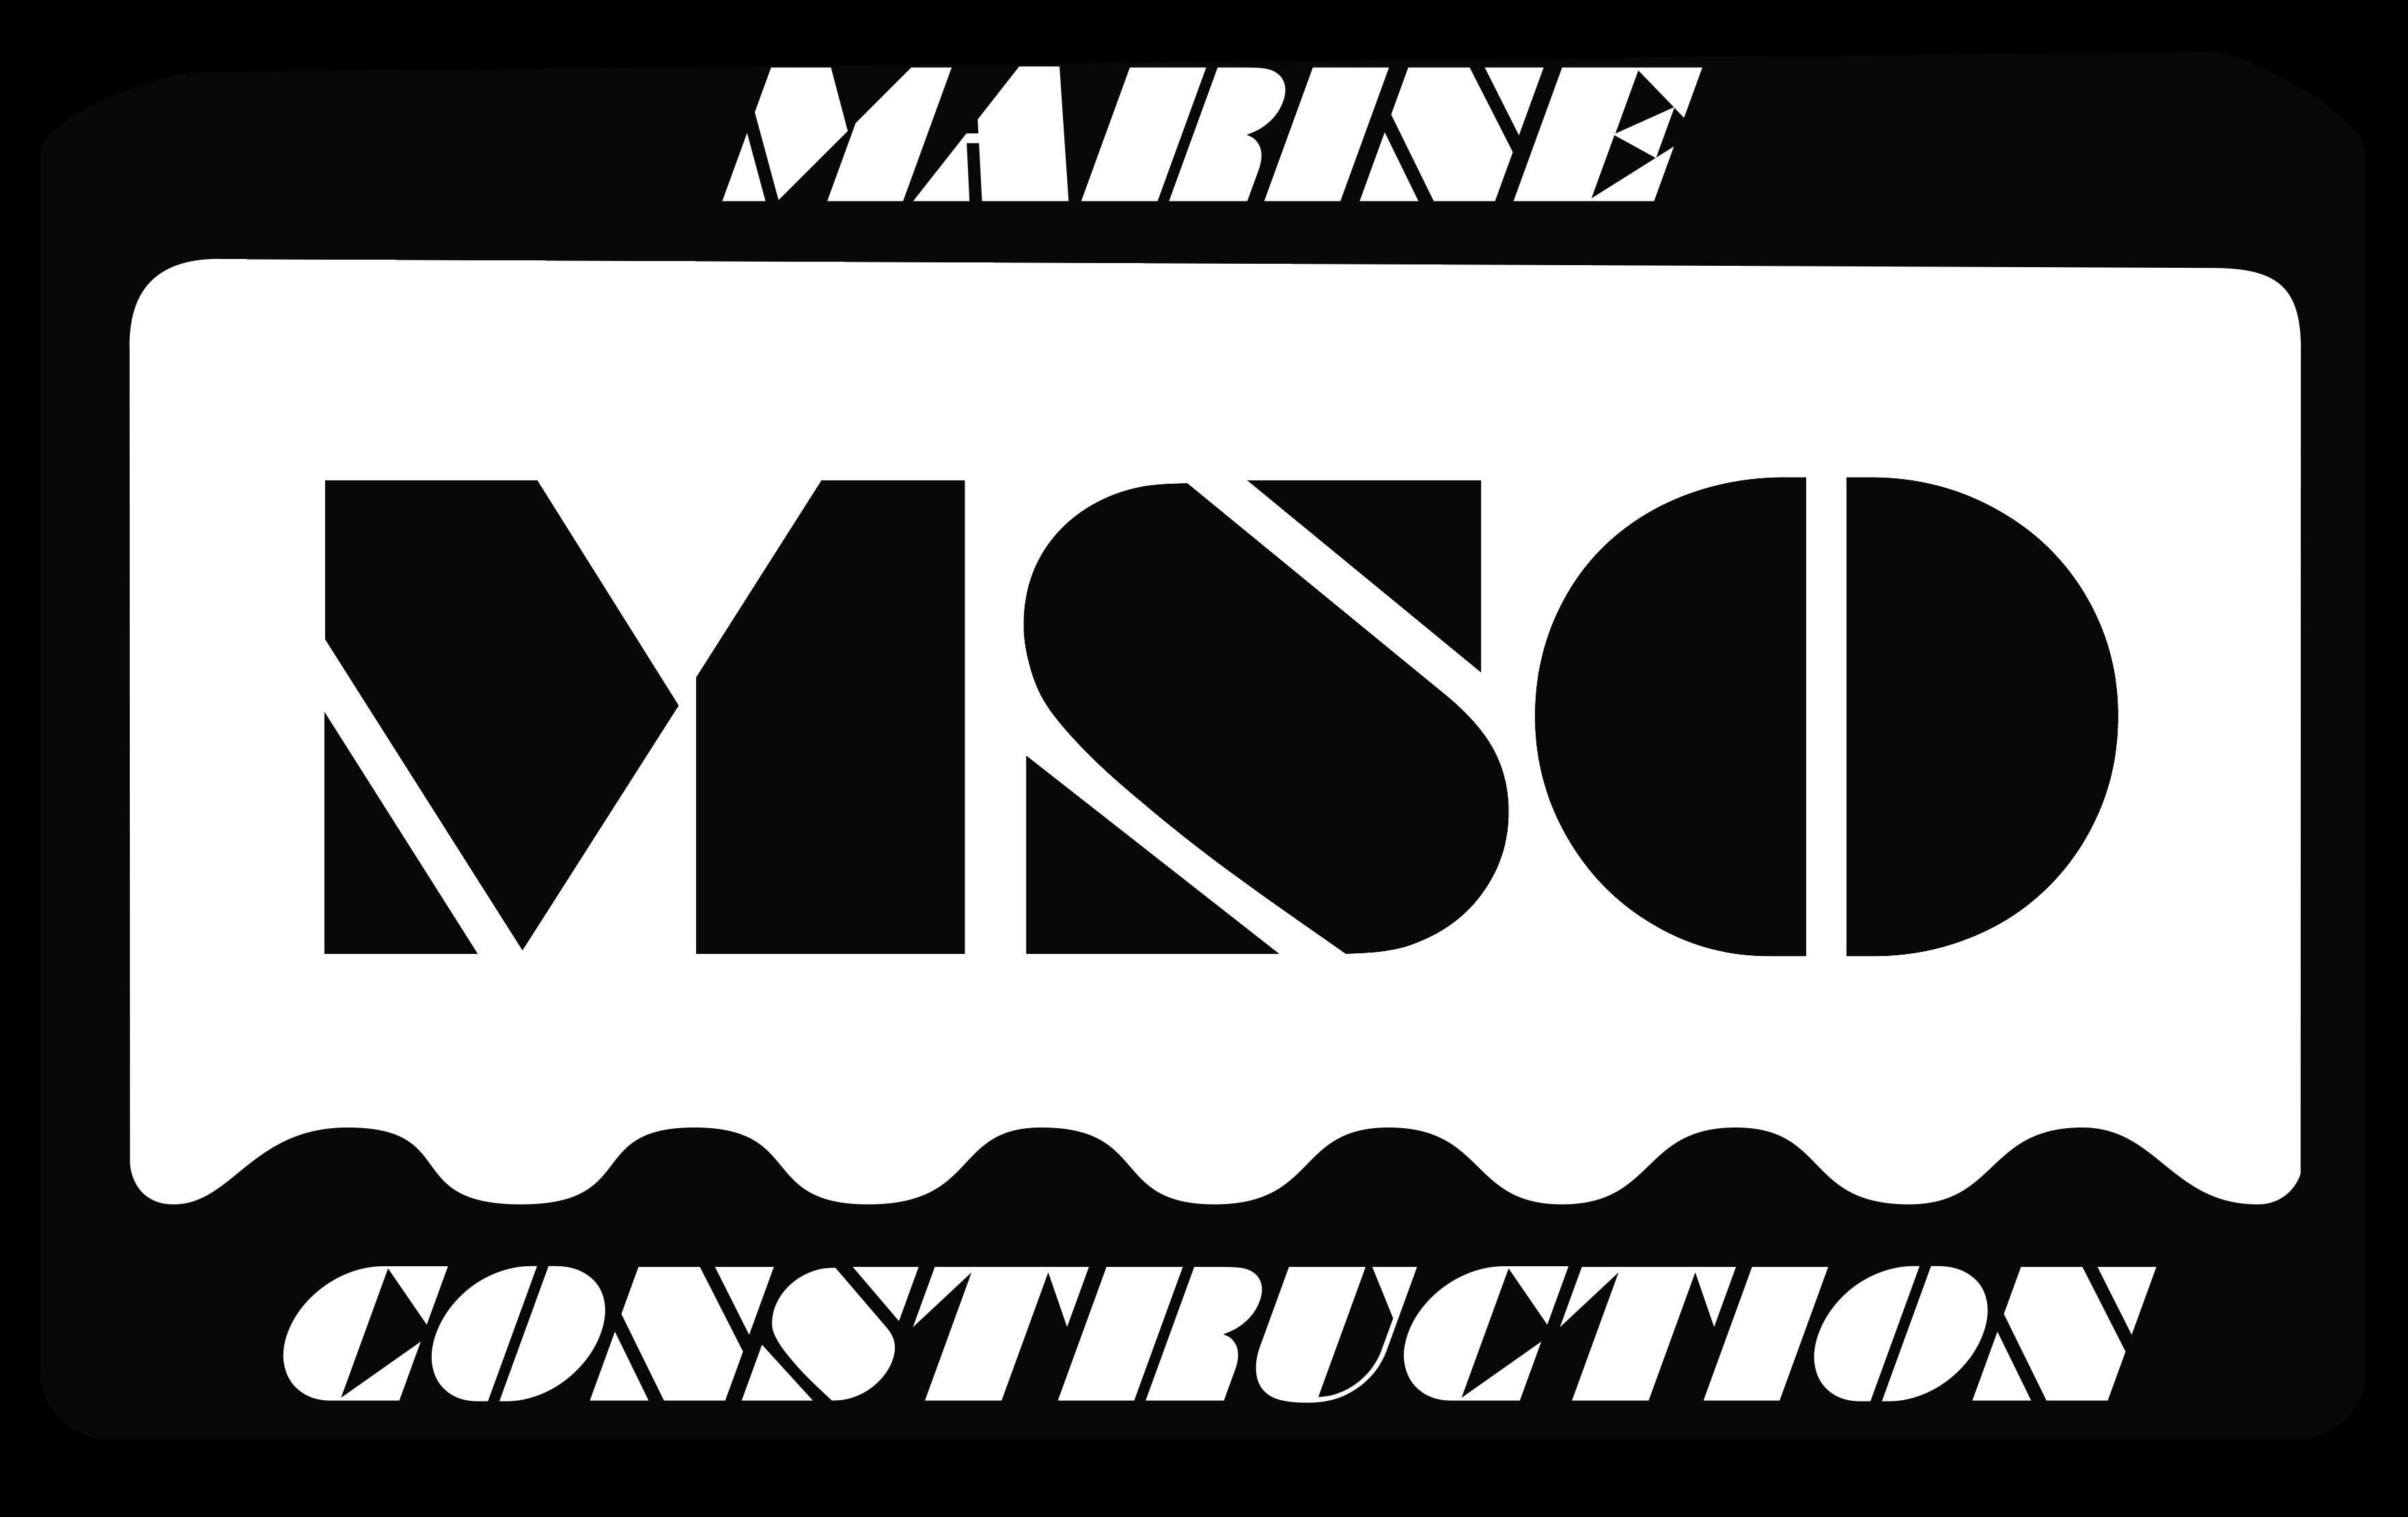 MSO Marine logo